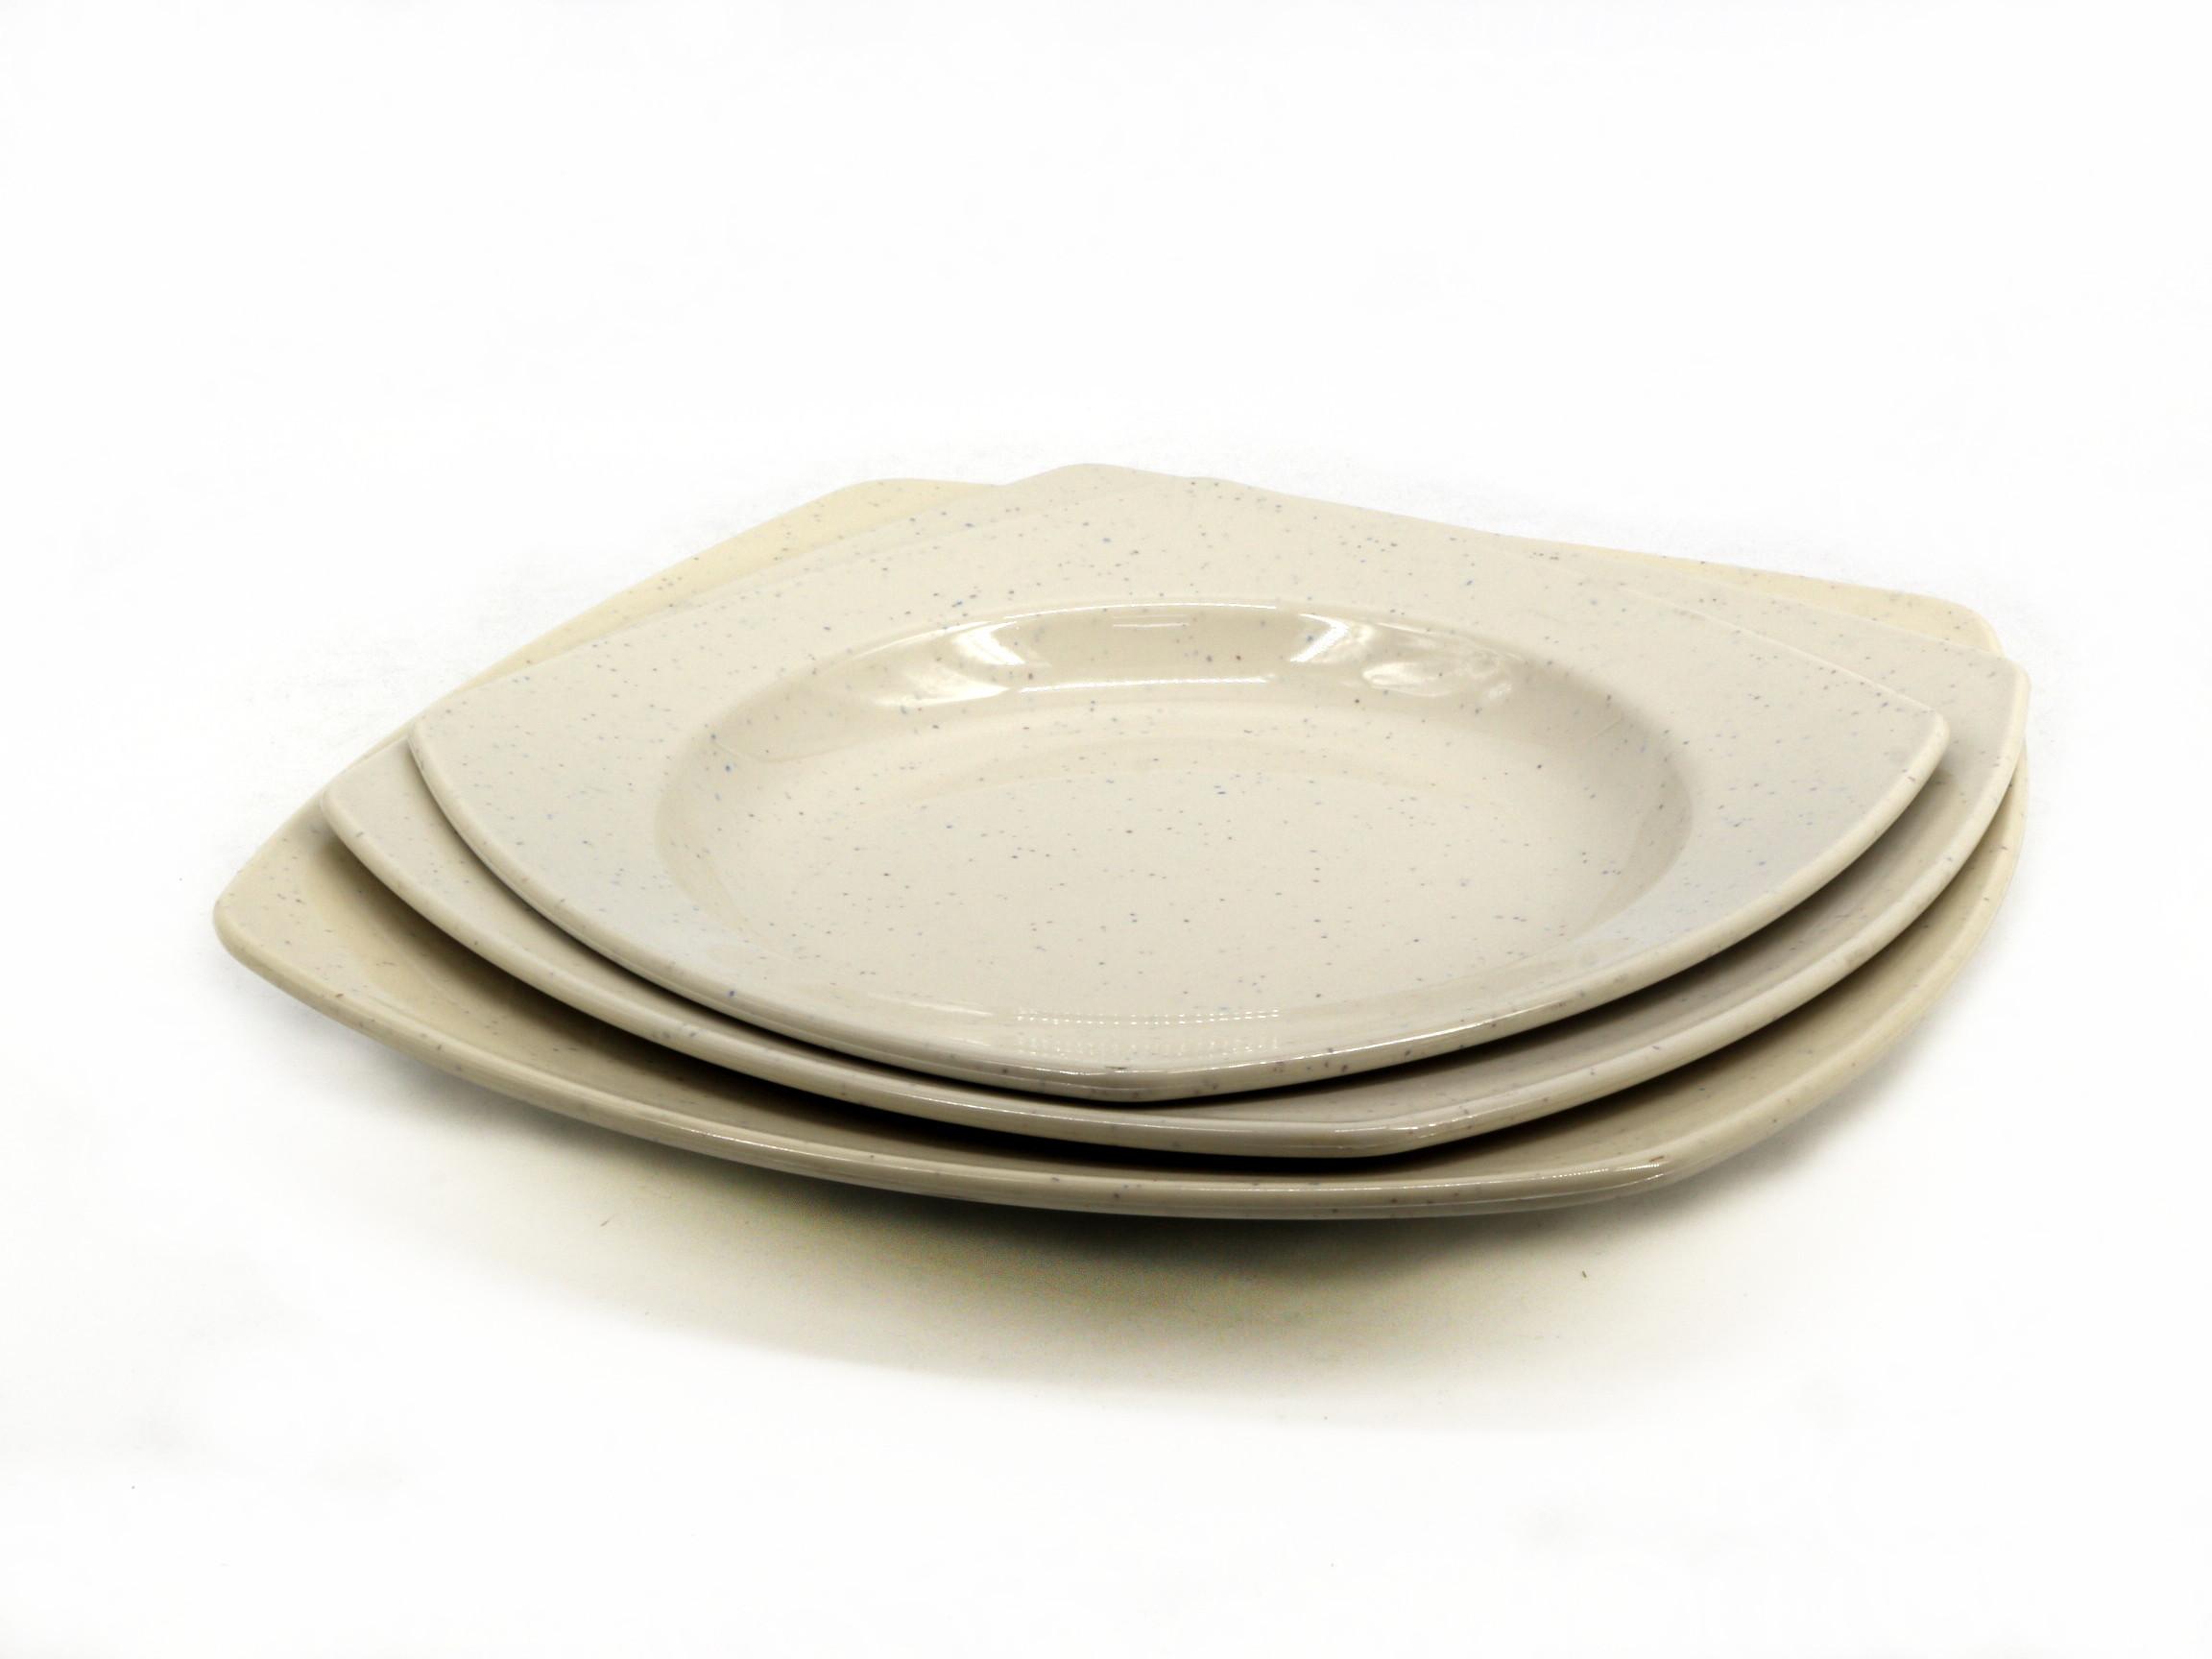 Toyogo dining plate set B  3 in 1 / piring set 3 dalam 1